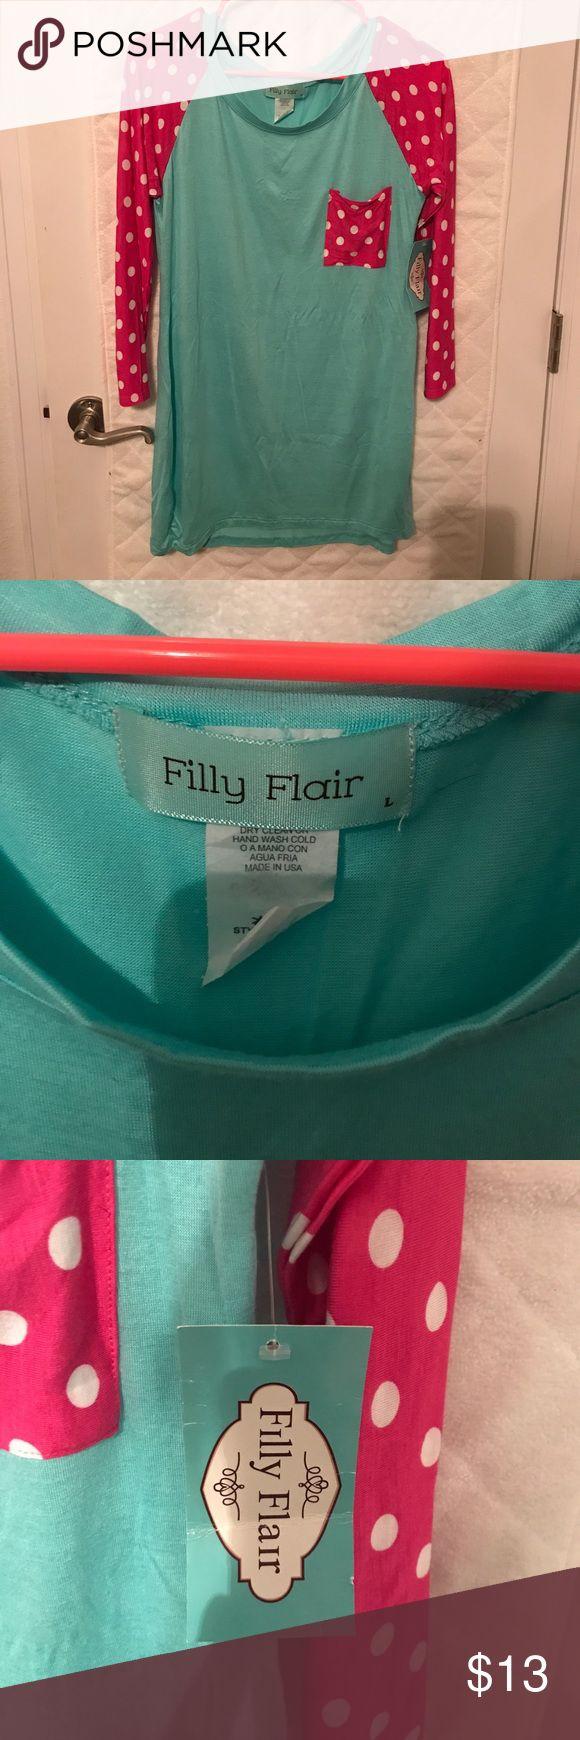 Cute polka dot shirt! 3/4 length sleeves, polka dot shirt, size large, new w/tags Filly Flair  Tops